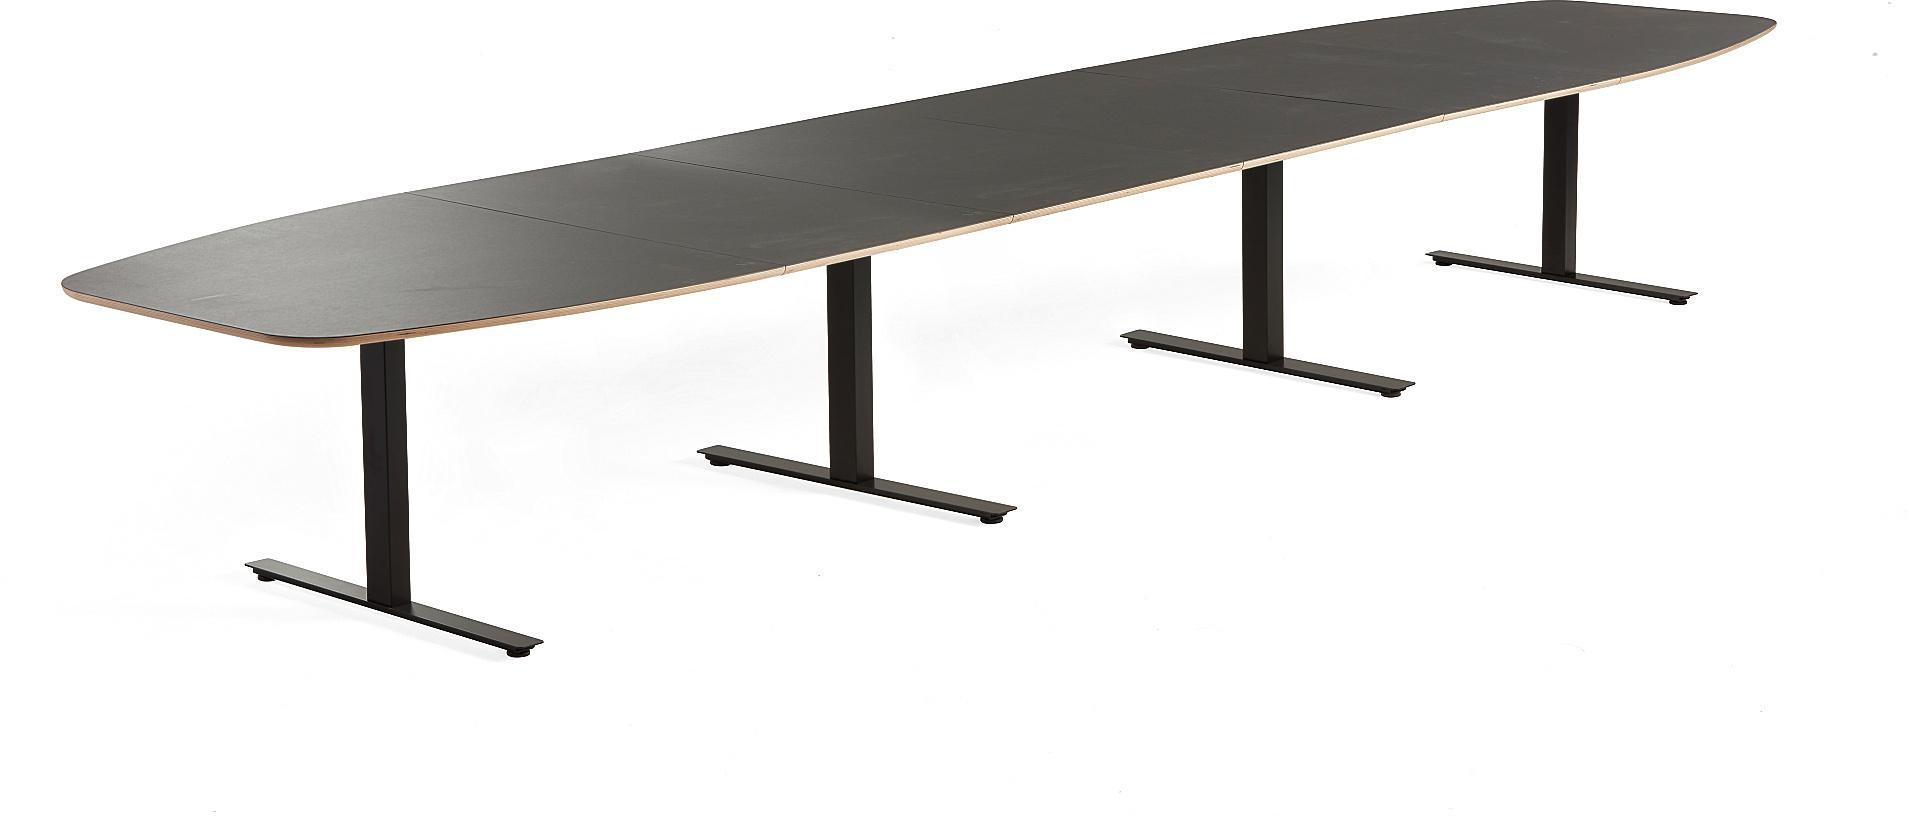 Rokovací stôl Audrey, 5600x1200 mm, čierny podstavec, tmavošedá doska